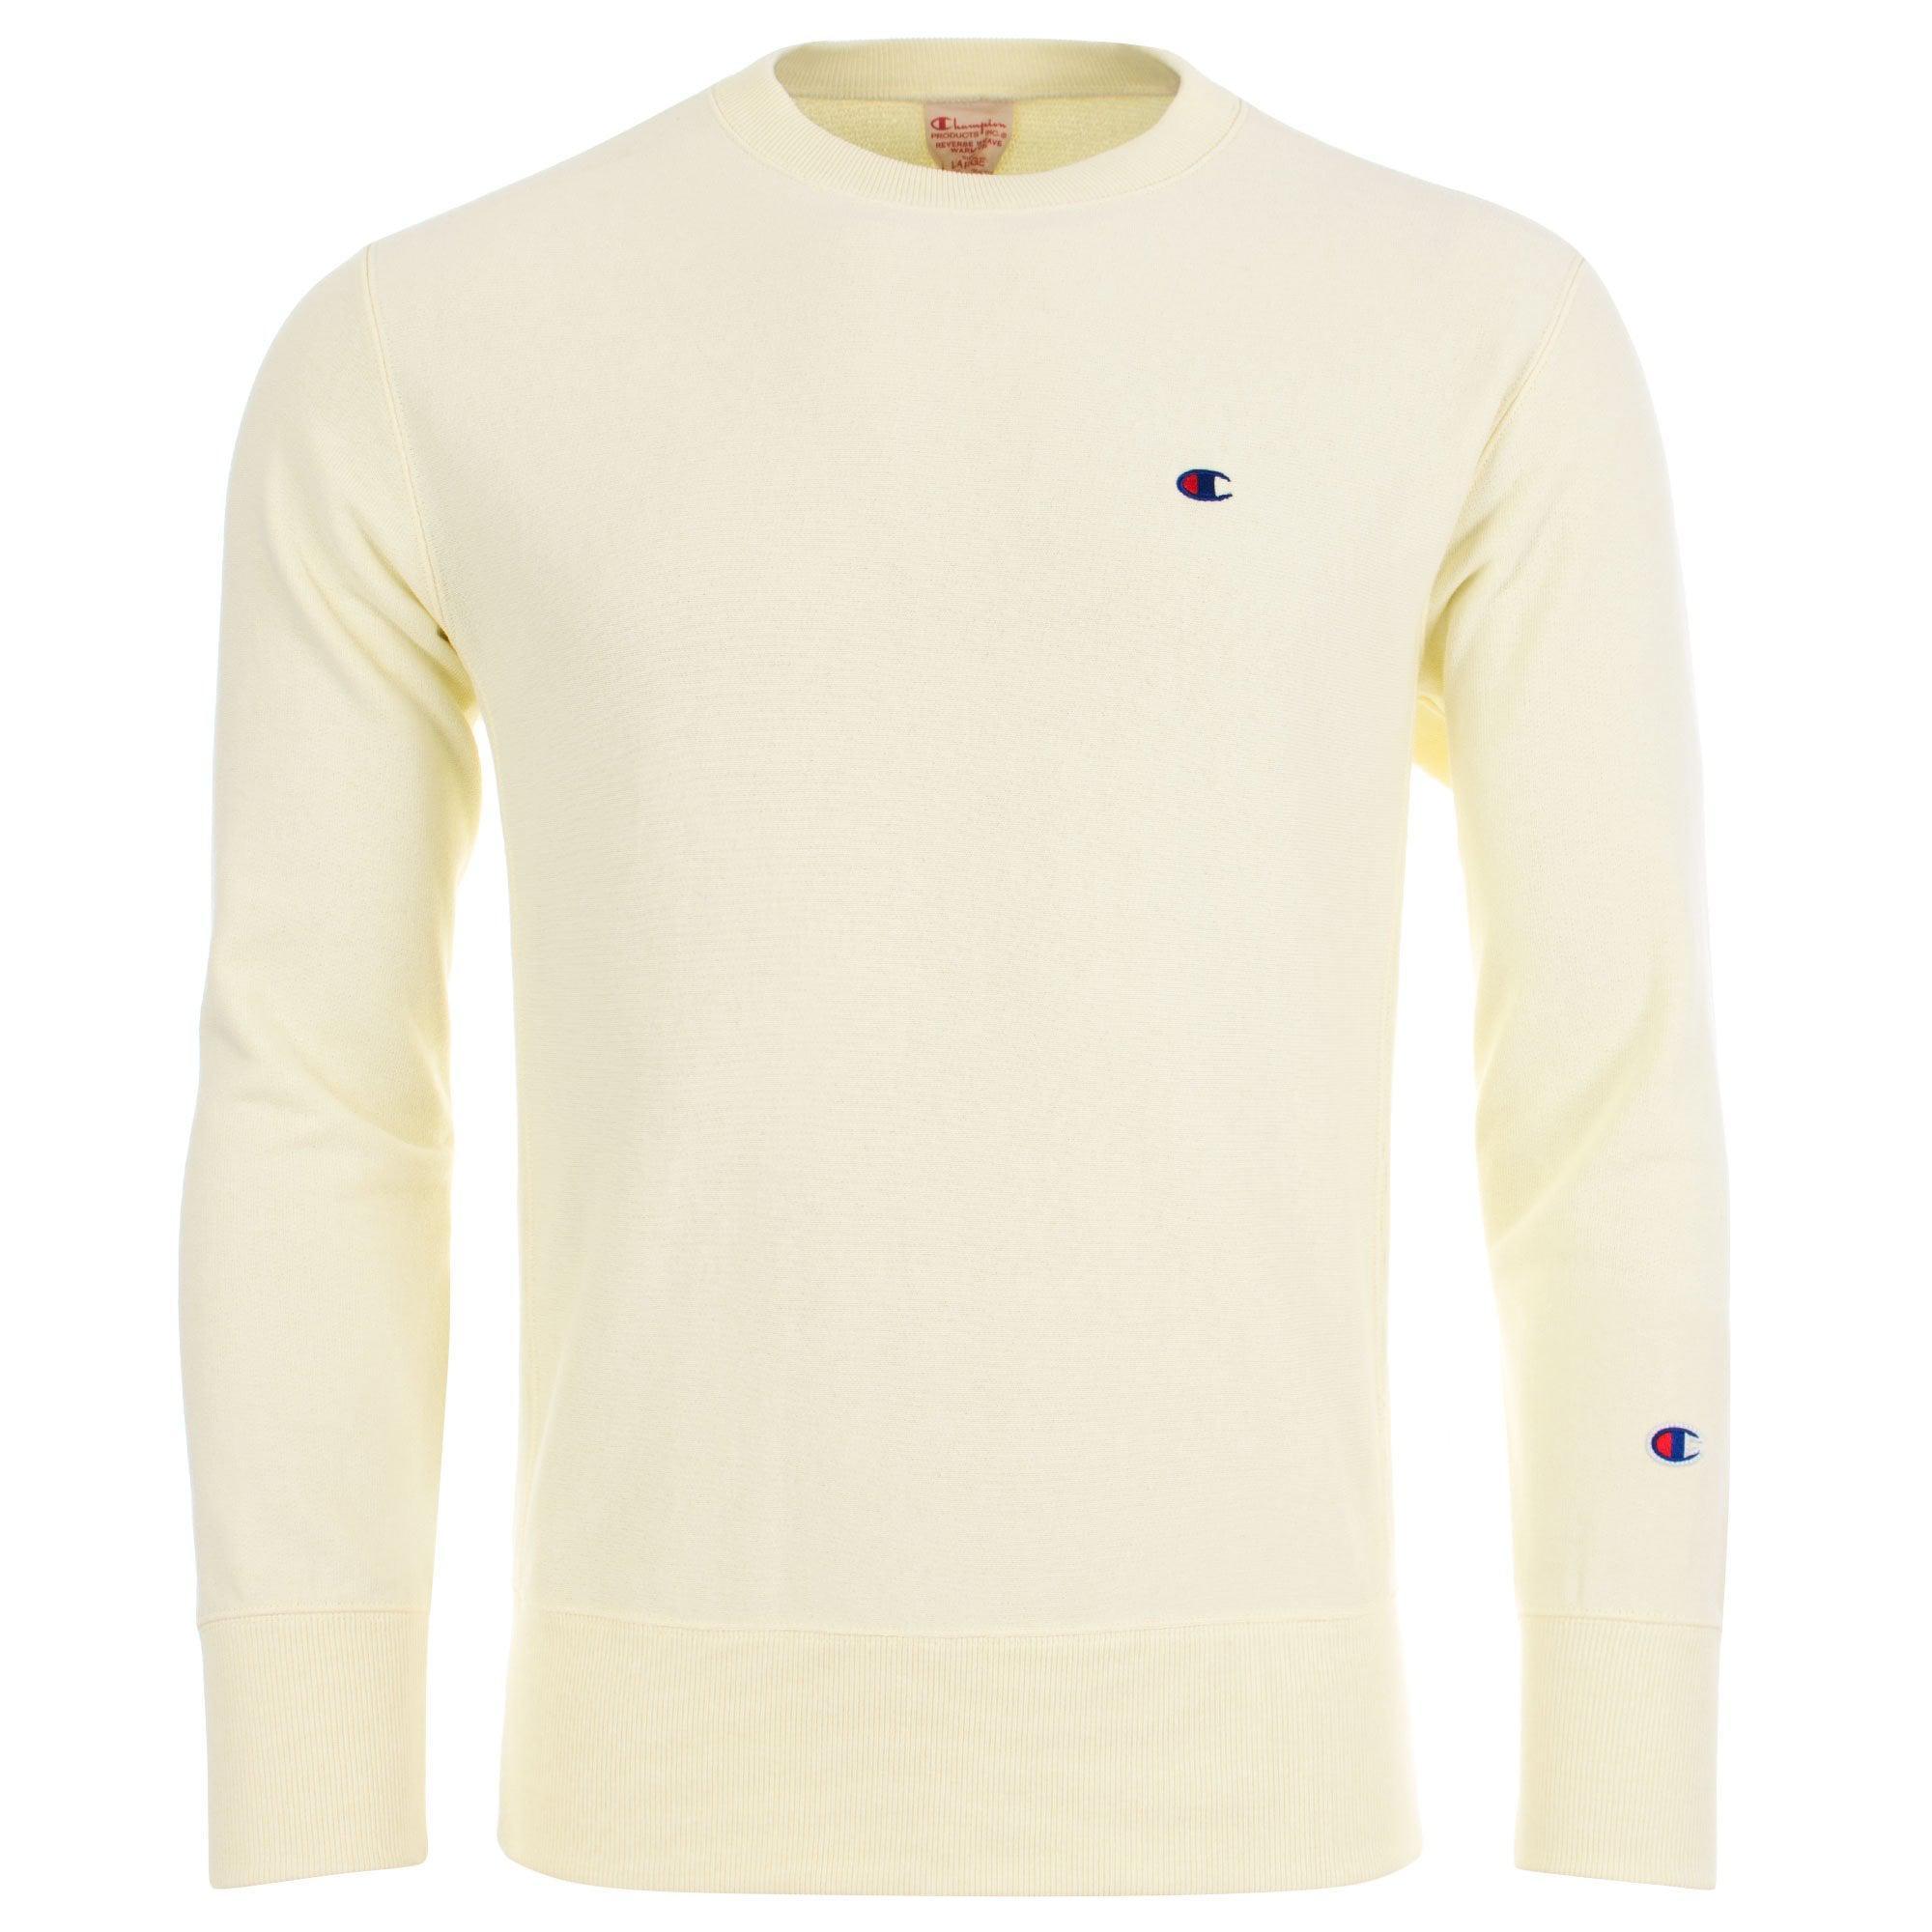 4b0daa72d Champion Reverse Weave Small Logo Sweatshirt in Yellow for Men - Lyst